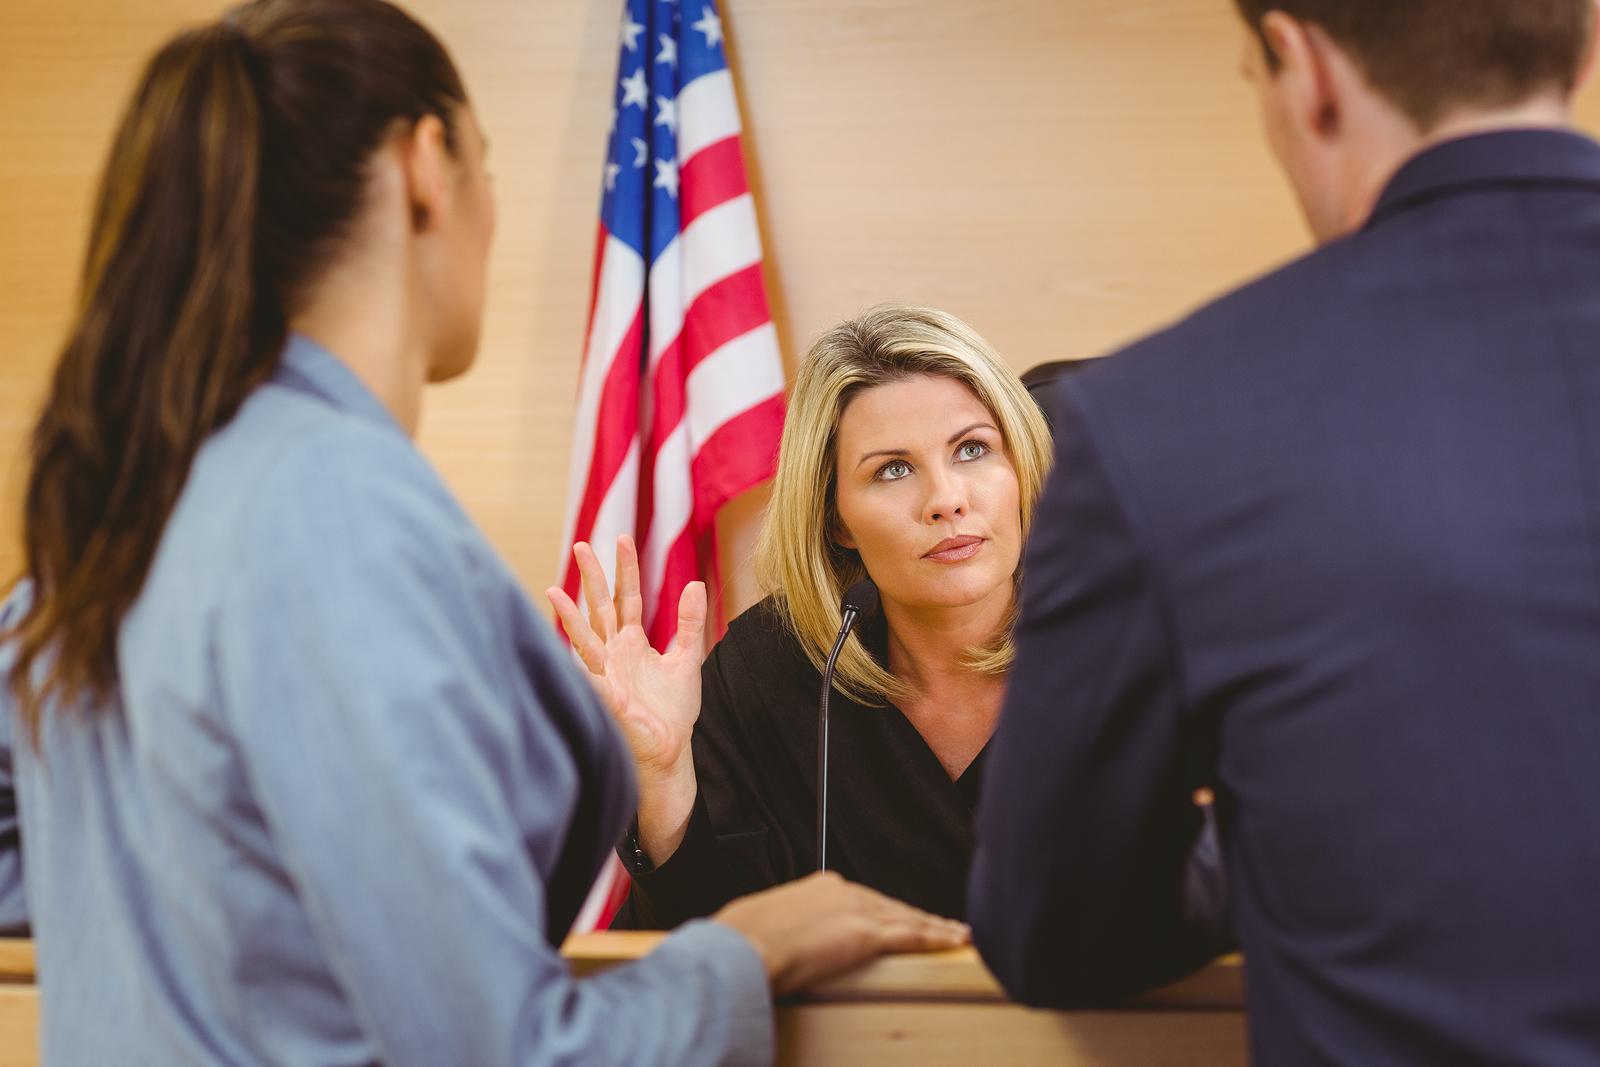 bigstock-Judge-and-lawyers-speaking-in--80219810.jpg